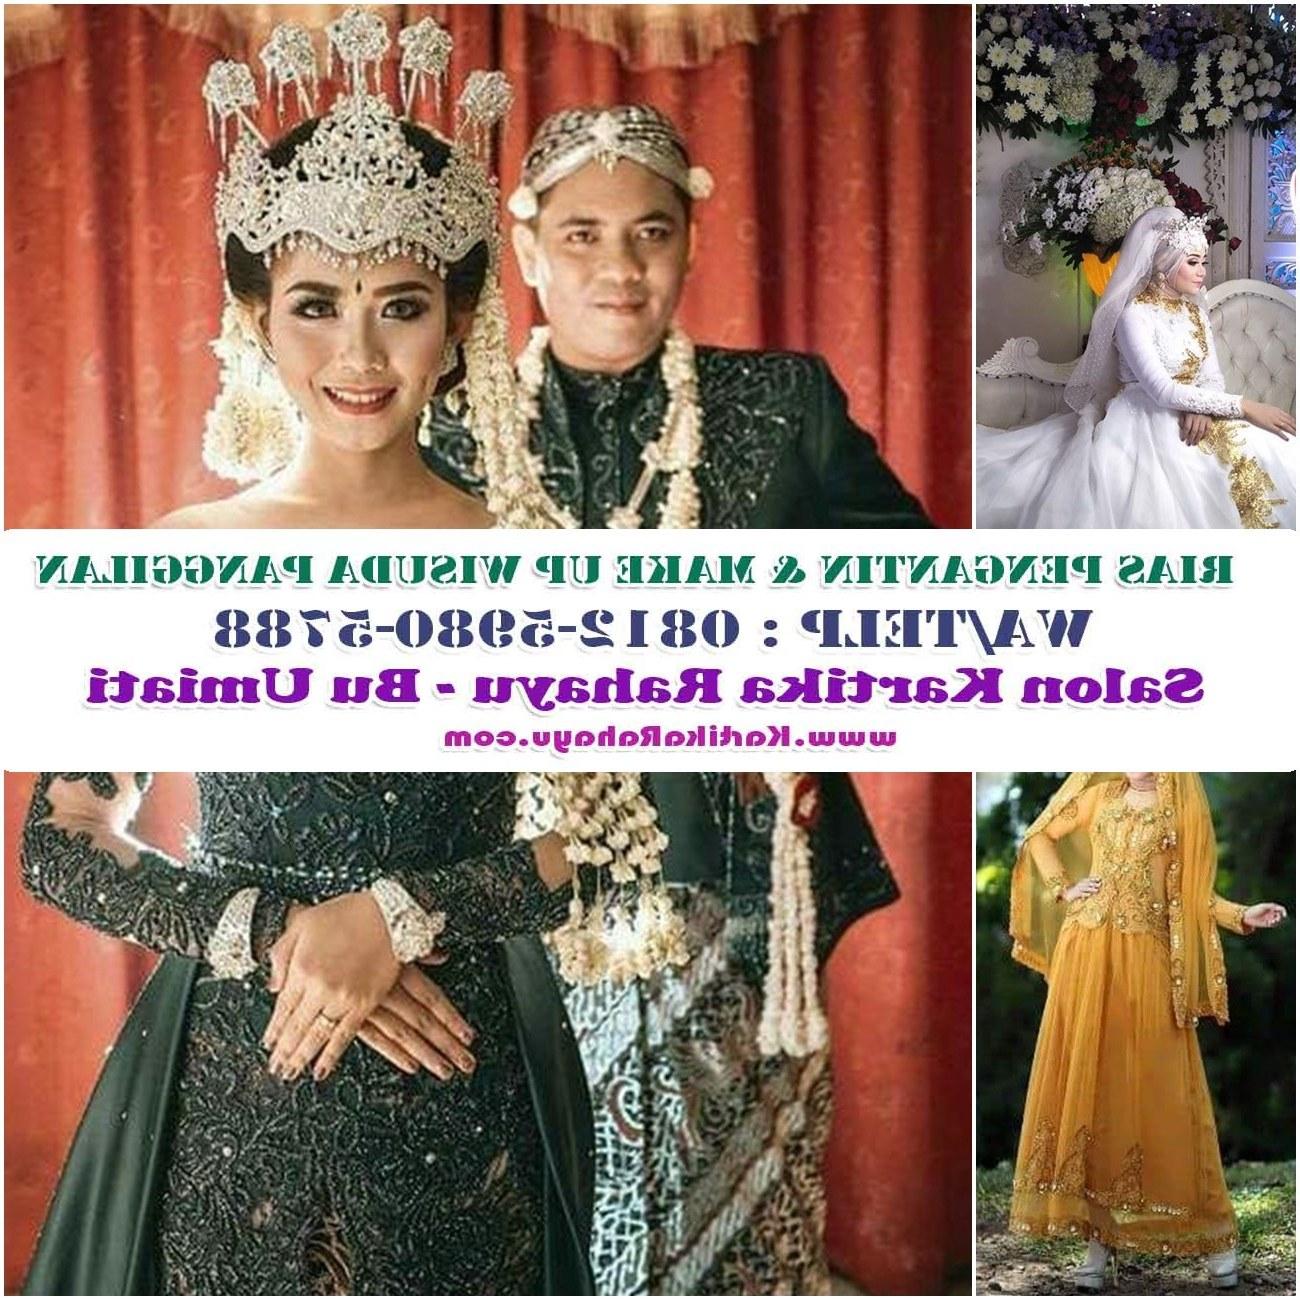 Model Sewa Baju Pengantin Muslimah Tangerang Etdg Make Up Wisuda Malang Kota Malang Jawa Timur